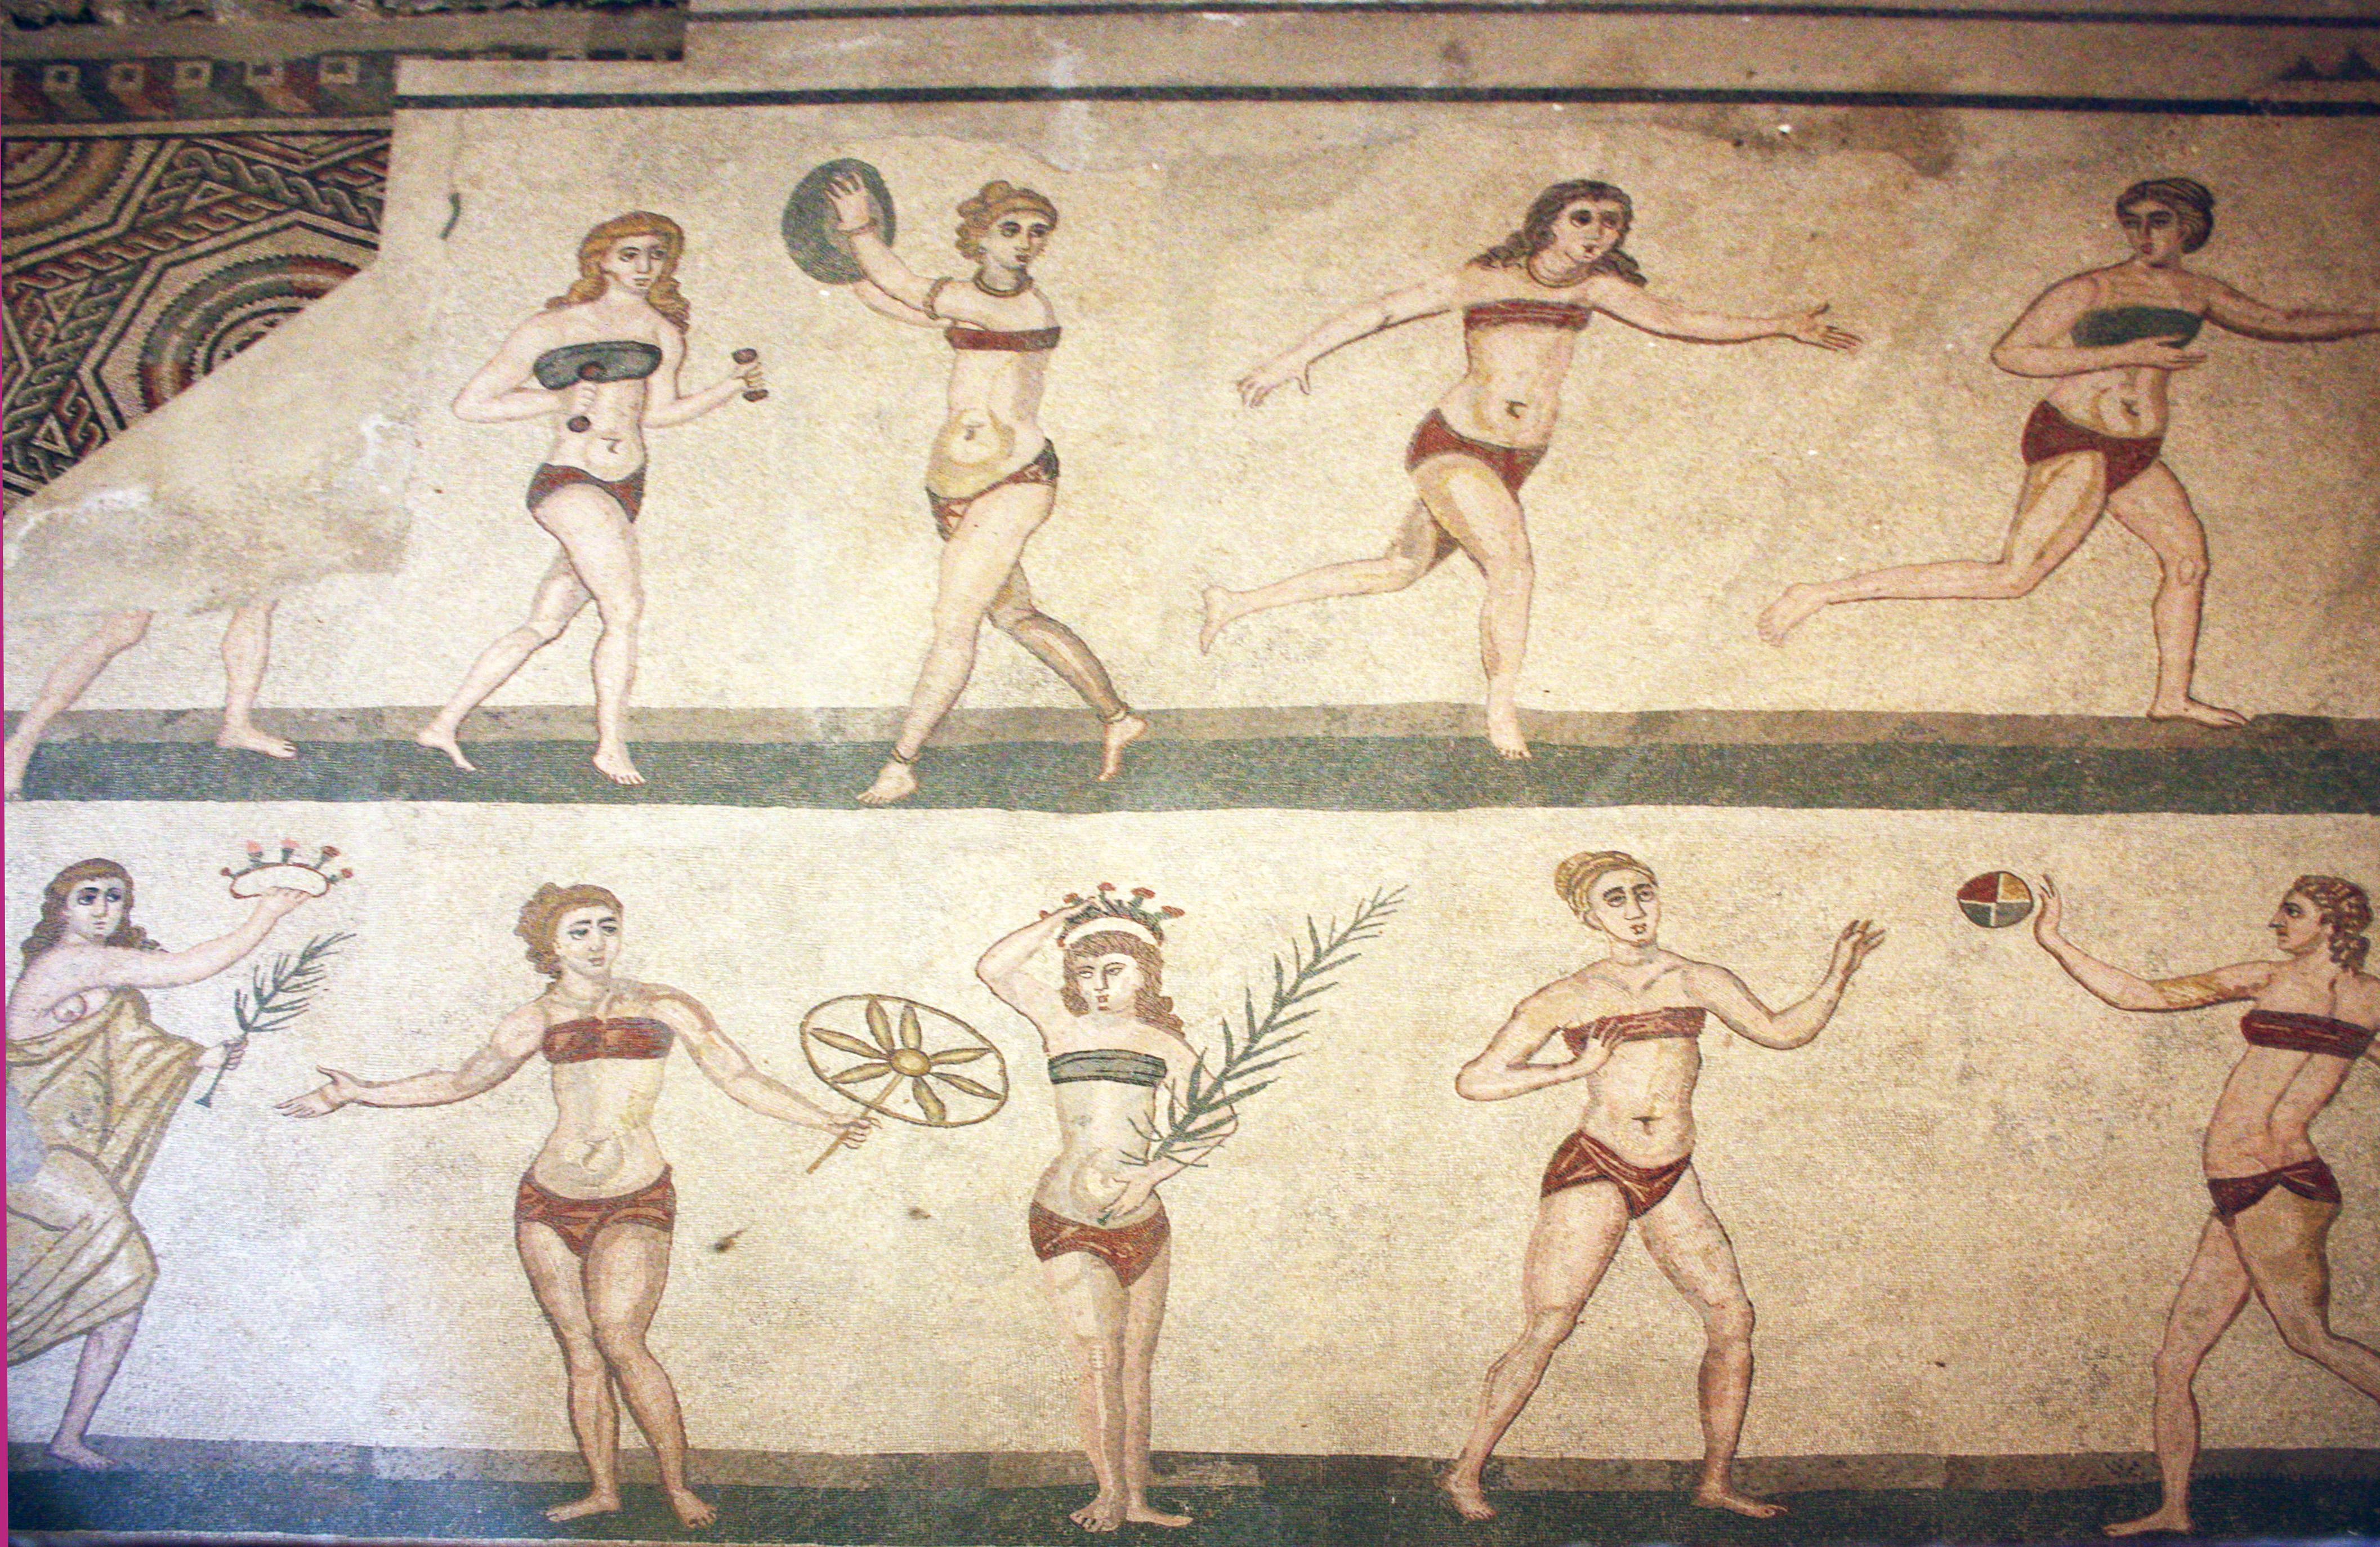 villa_romana_bikini_girls.JPG